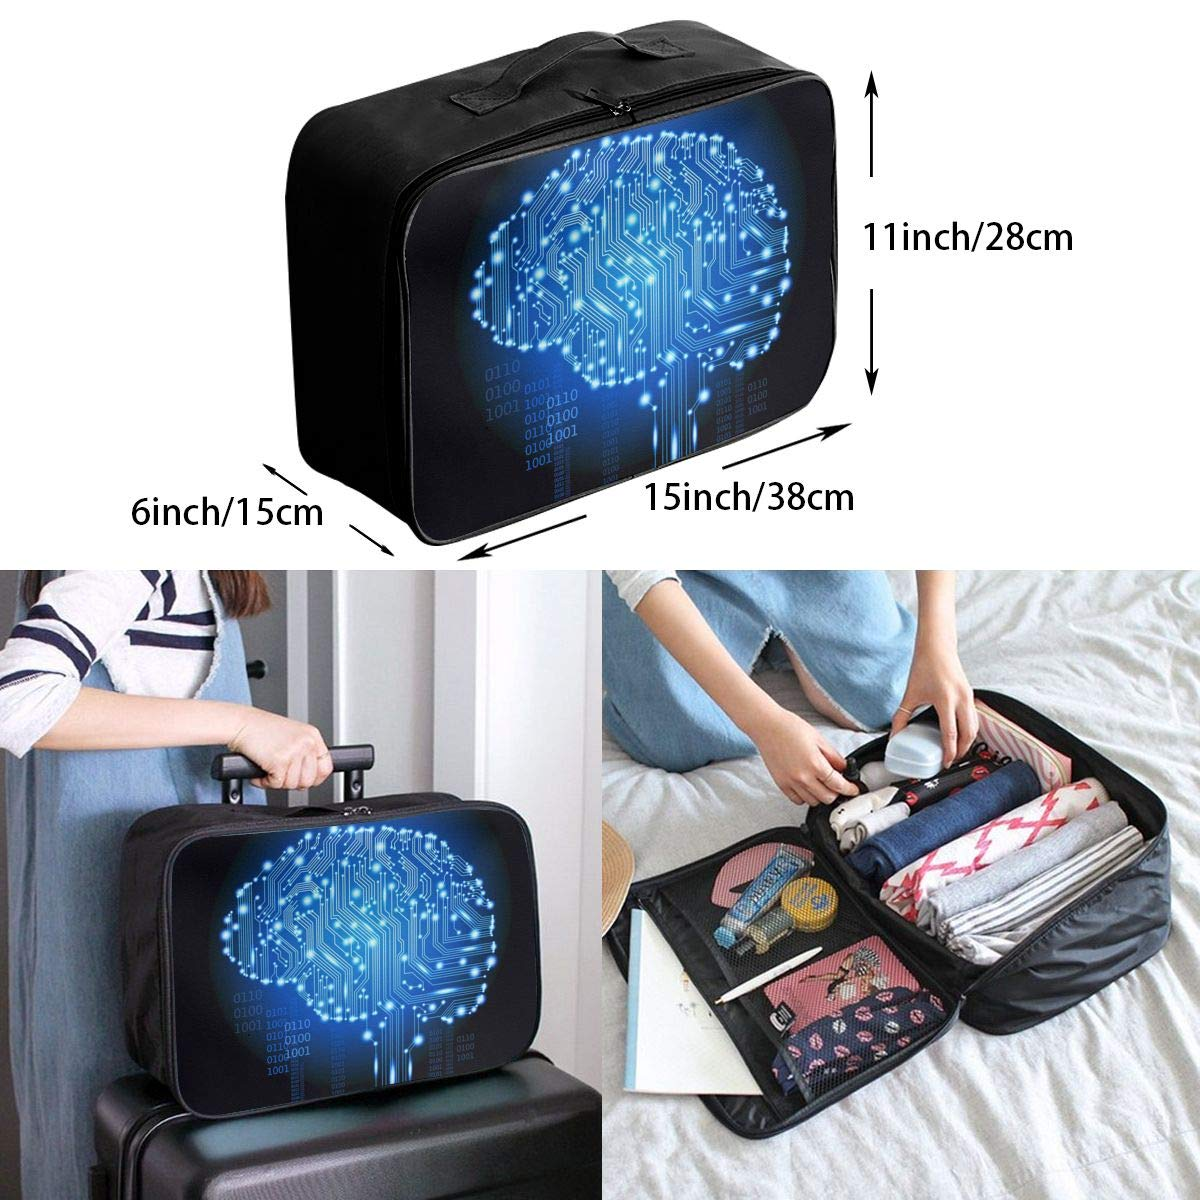 Travel Luggage Duffle Bag Lightweight Portable Handbag Brain Print Large Capacity Waterproof Foldable Storage Tote